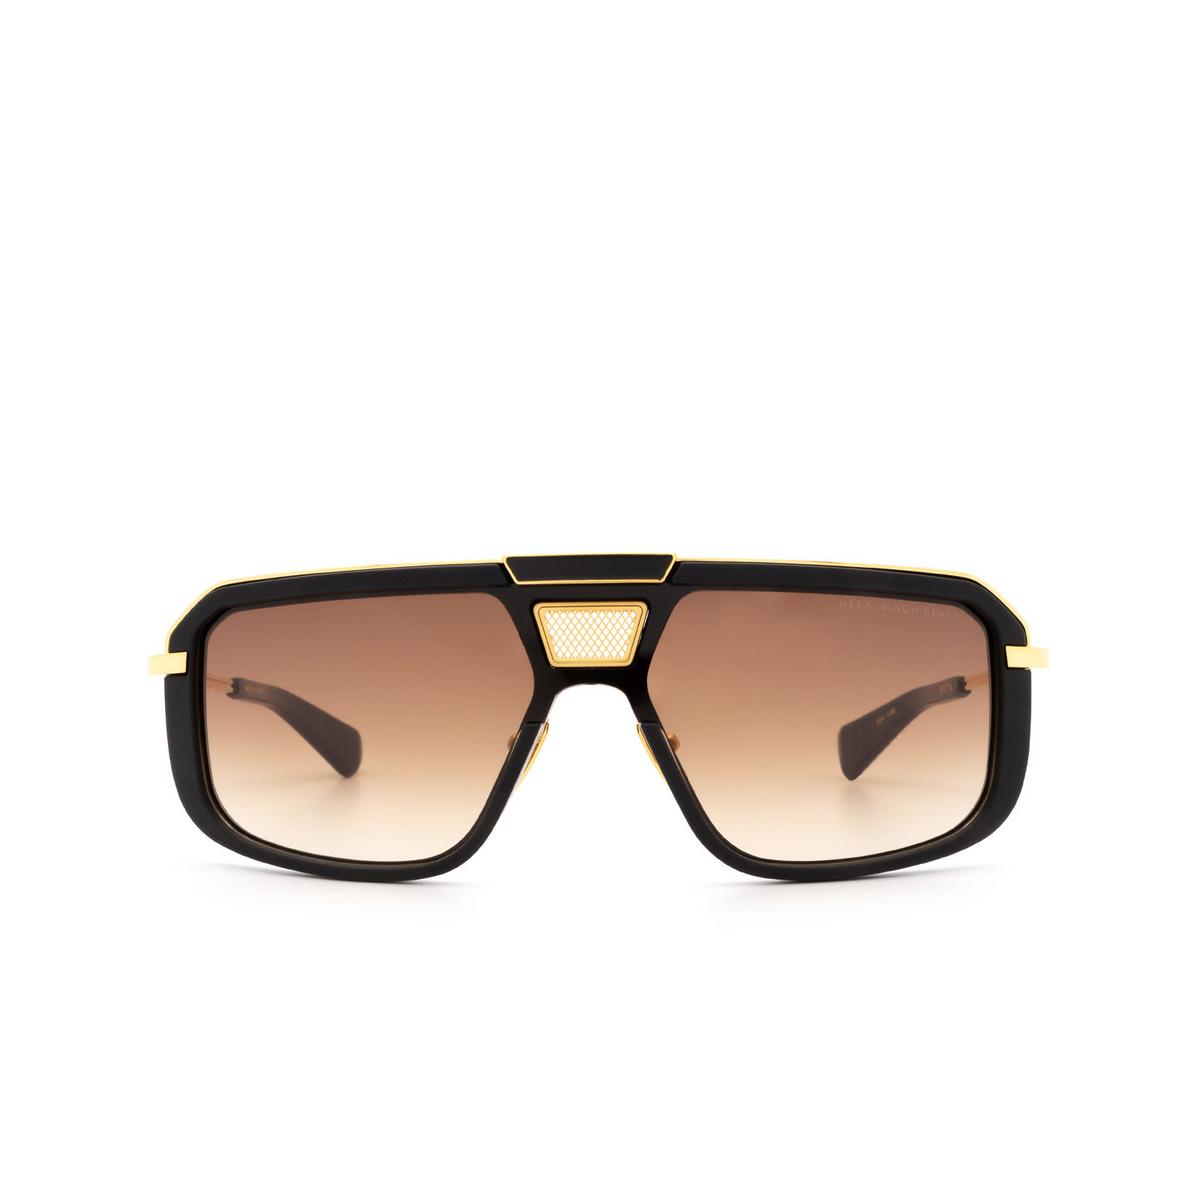 Dita® Aviator Sunglasses: Mach-eight DTS400-A-01-Z color Black & Gold Blk-gld.